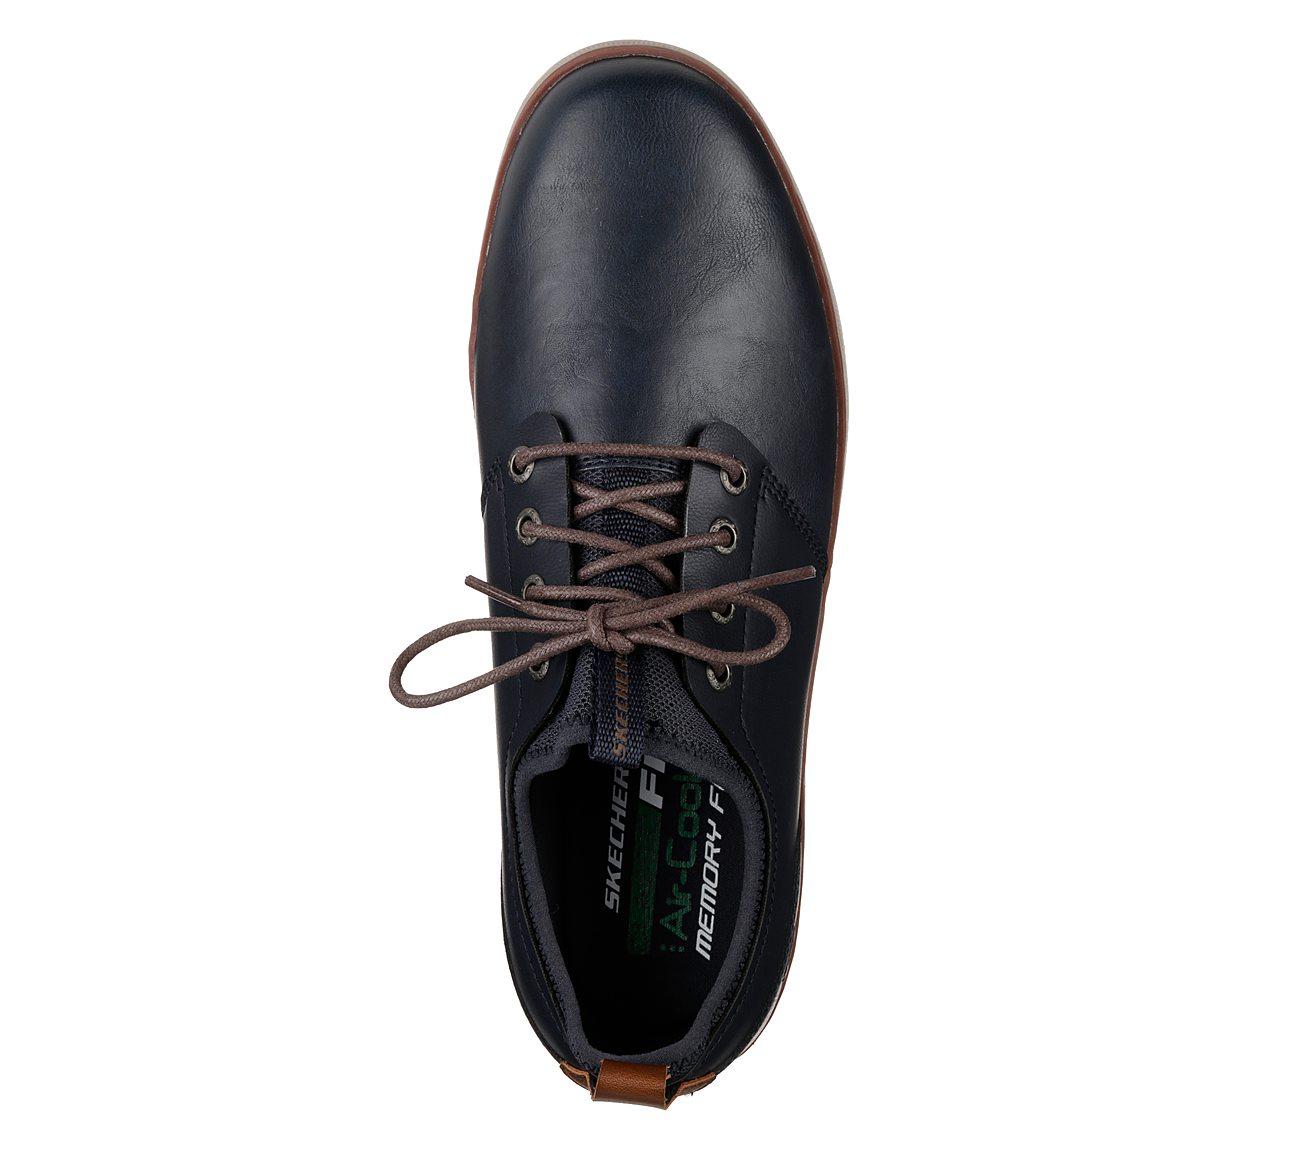 SKECHERS Heston - Rogic Comfort Shoes Shoes